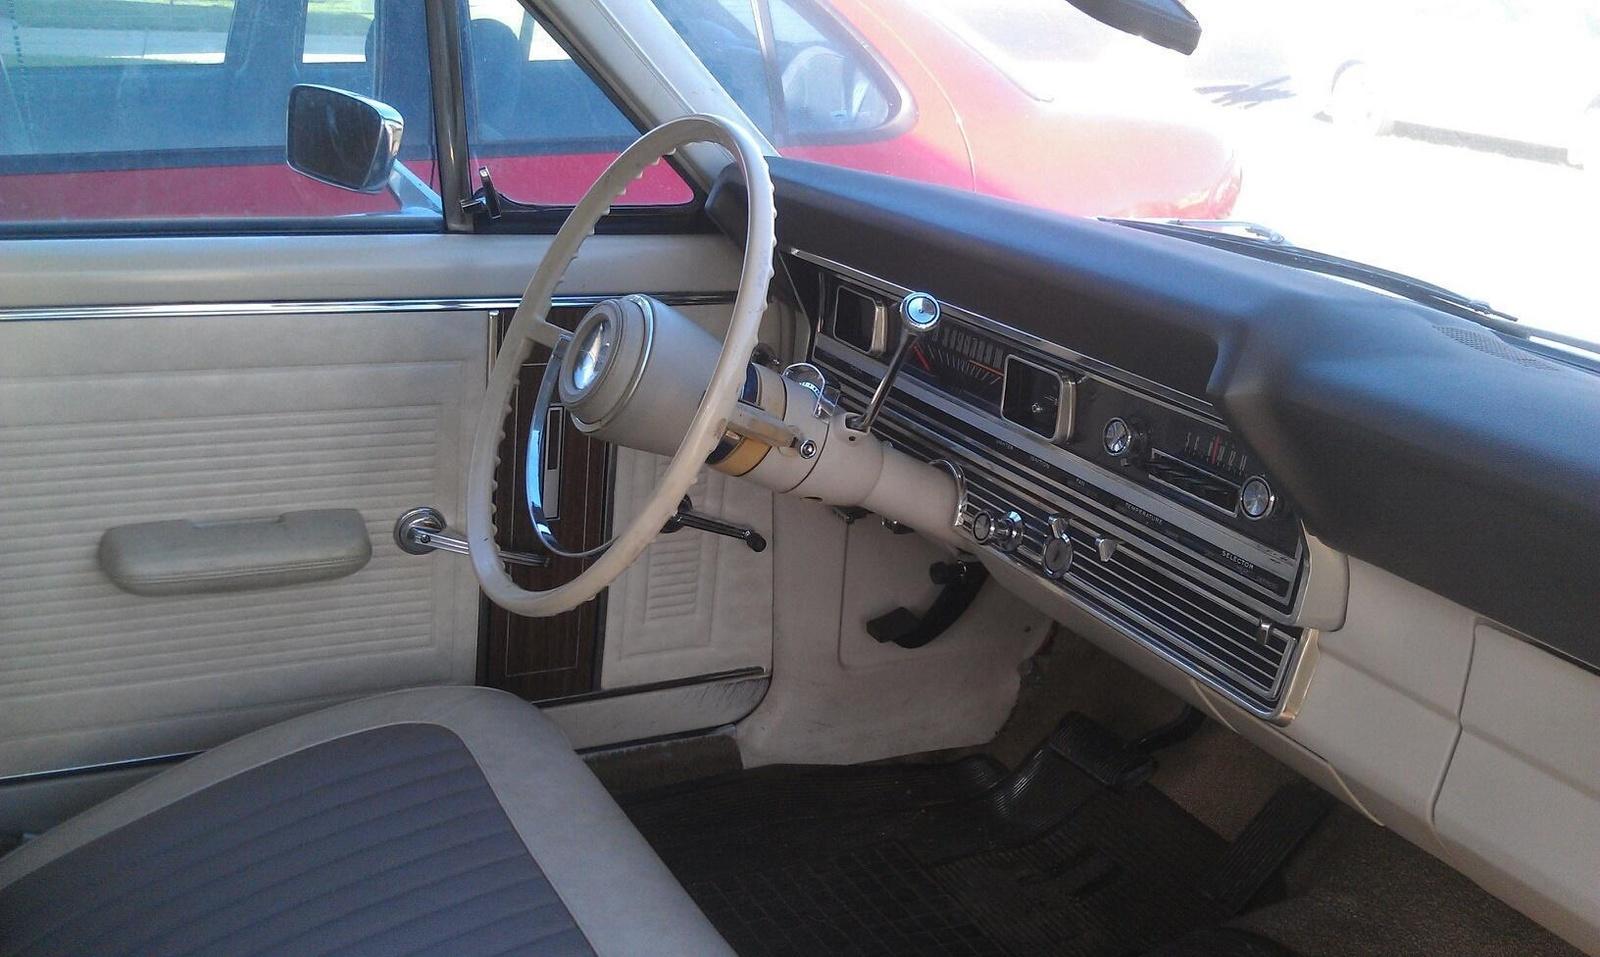 1967 Ford Fairlane Interior Cars Gallery